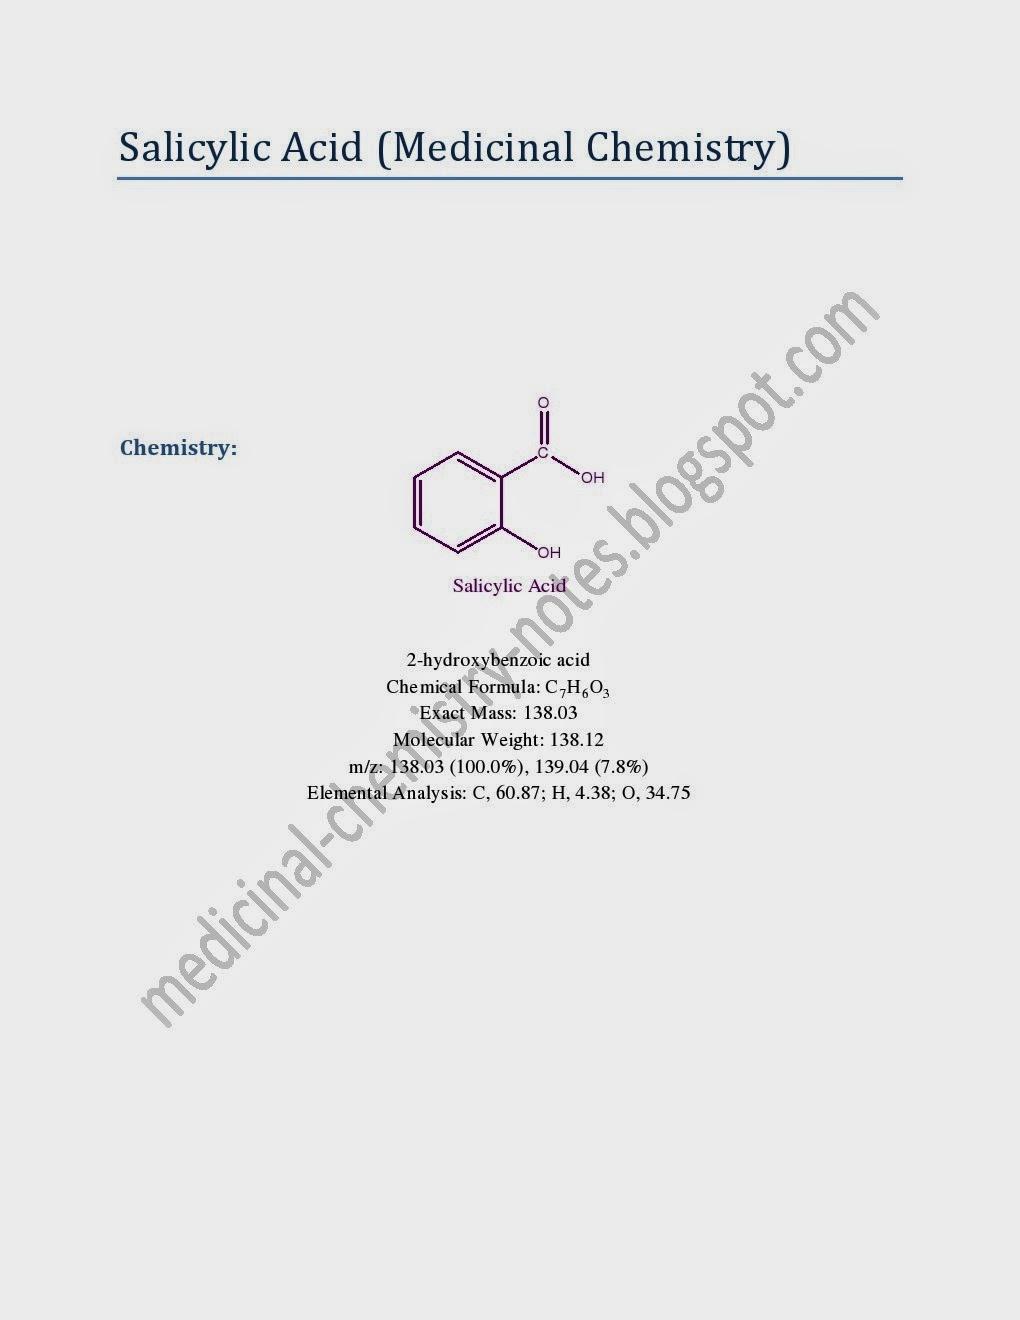 Medicinal Chemistry of Salicylic Acid